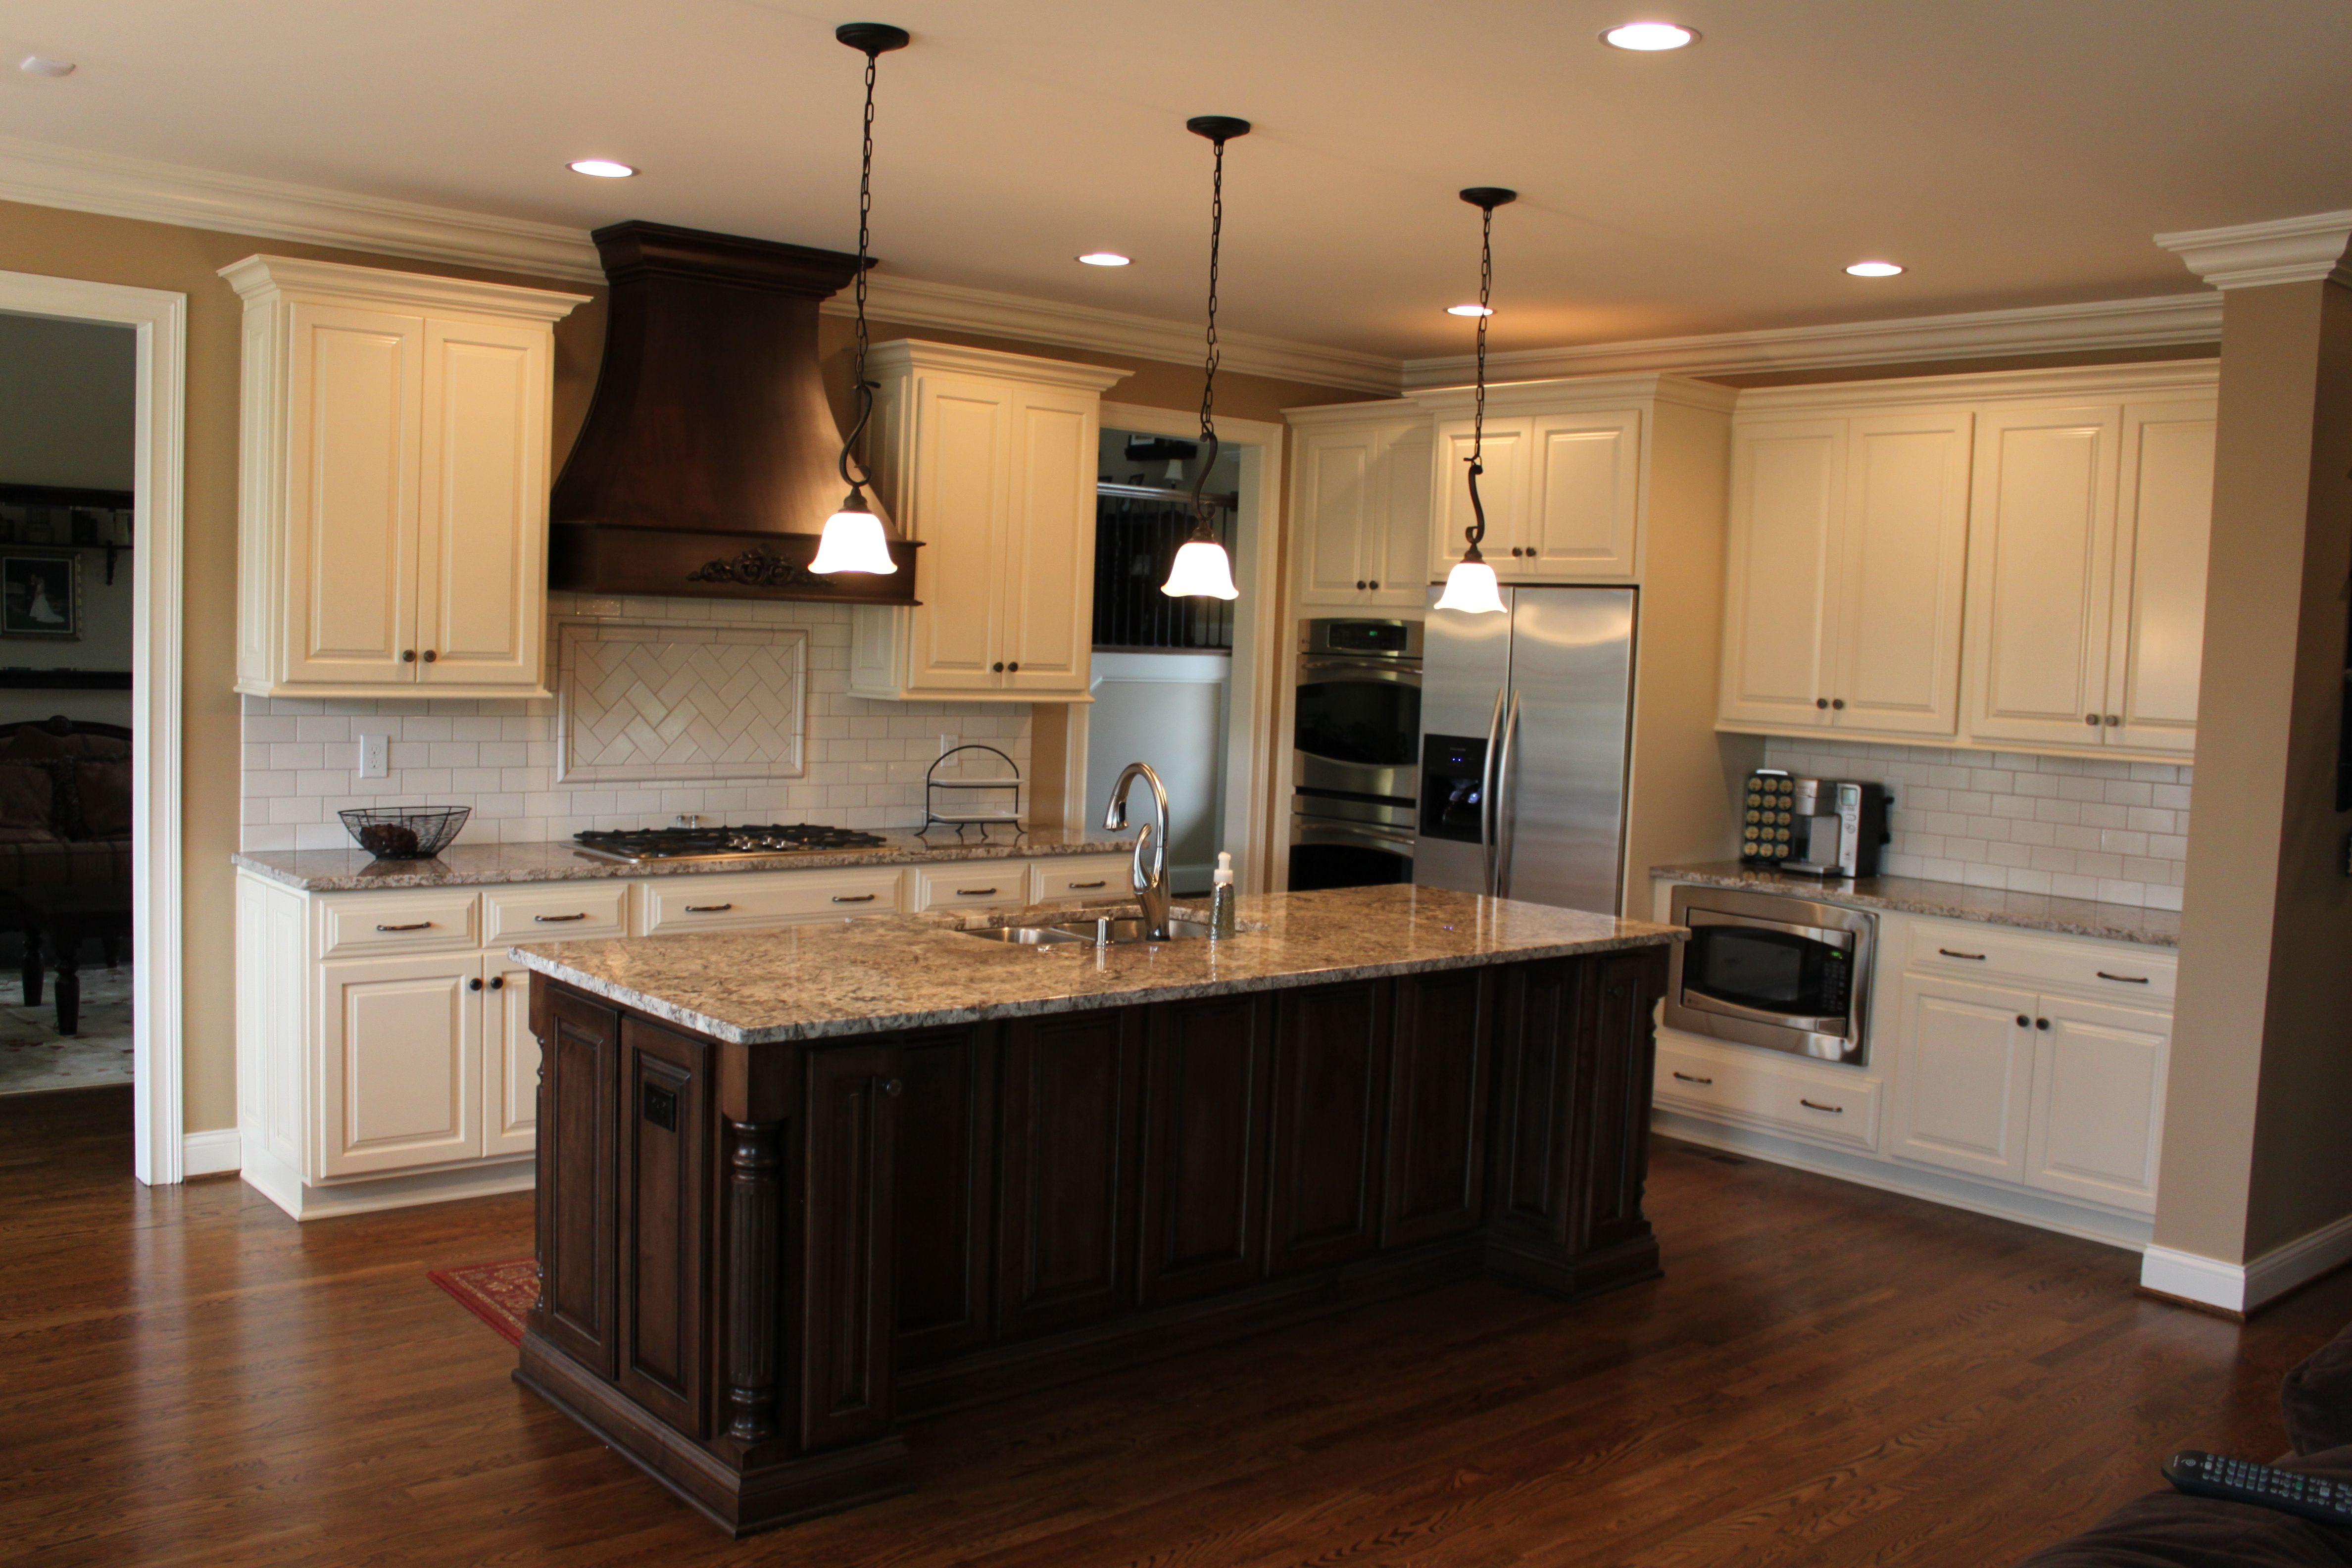 brauch custom cabinetry perimeter is maple painted linen with kitchens brauch custom cabinetry perimeter is maple painted linen with the oxford raised panel door